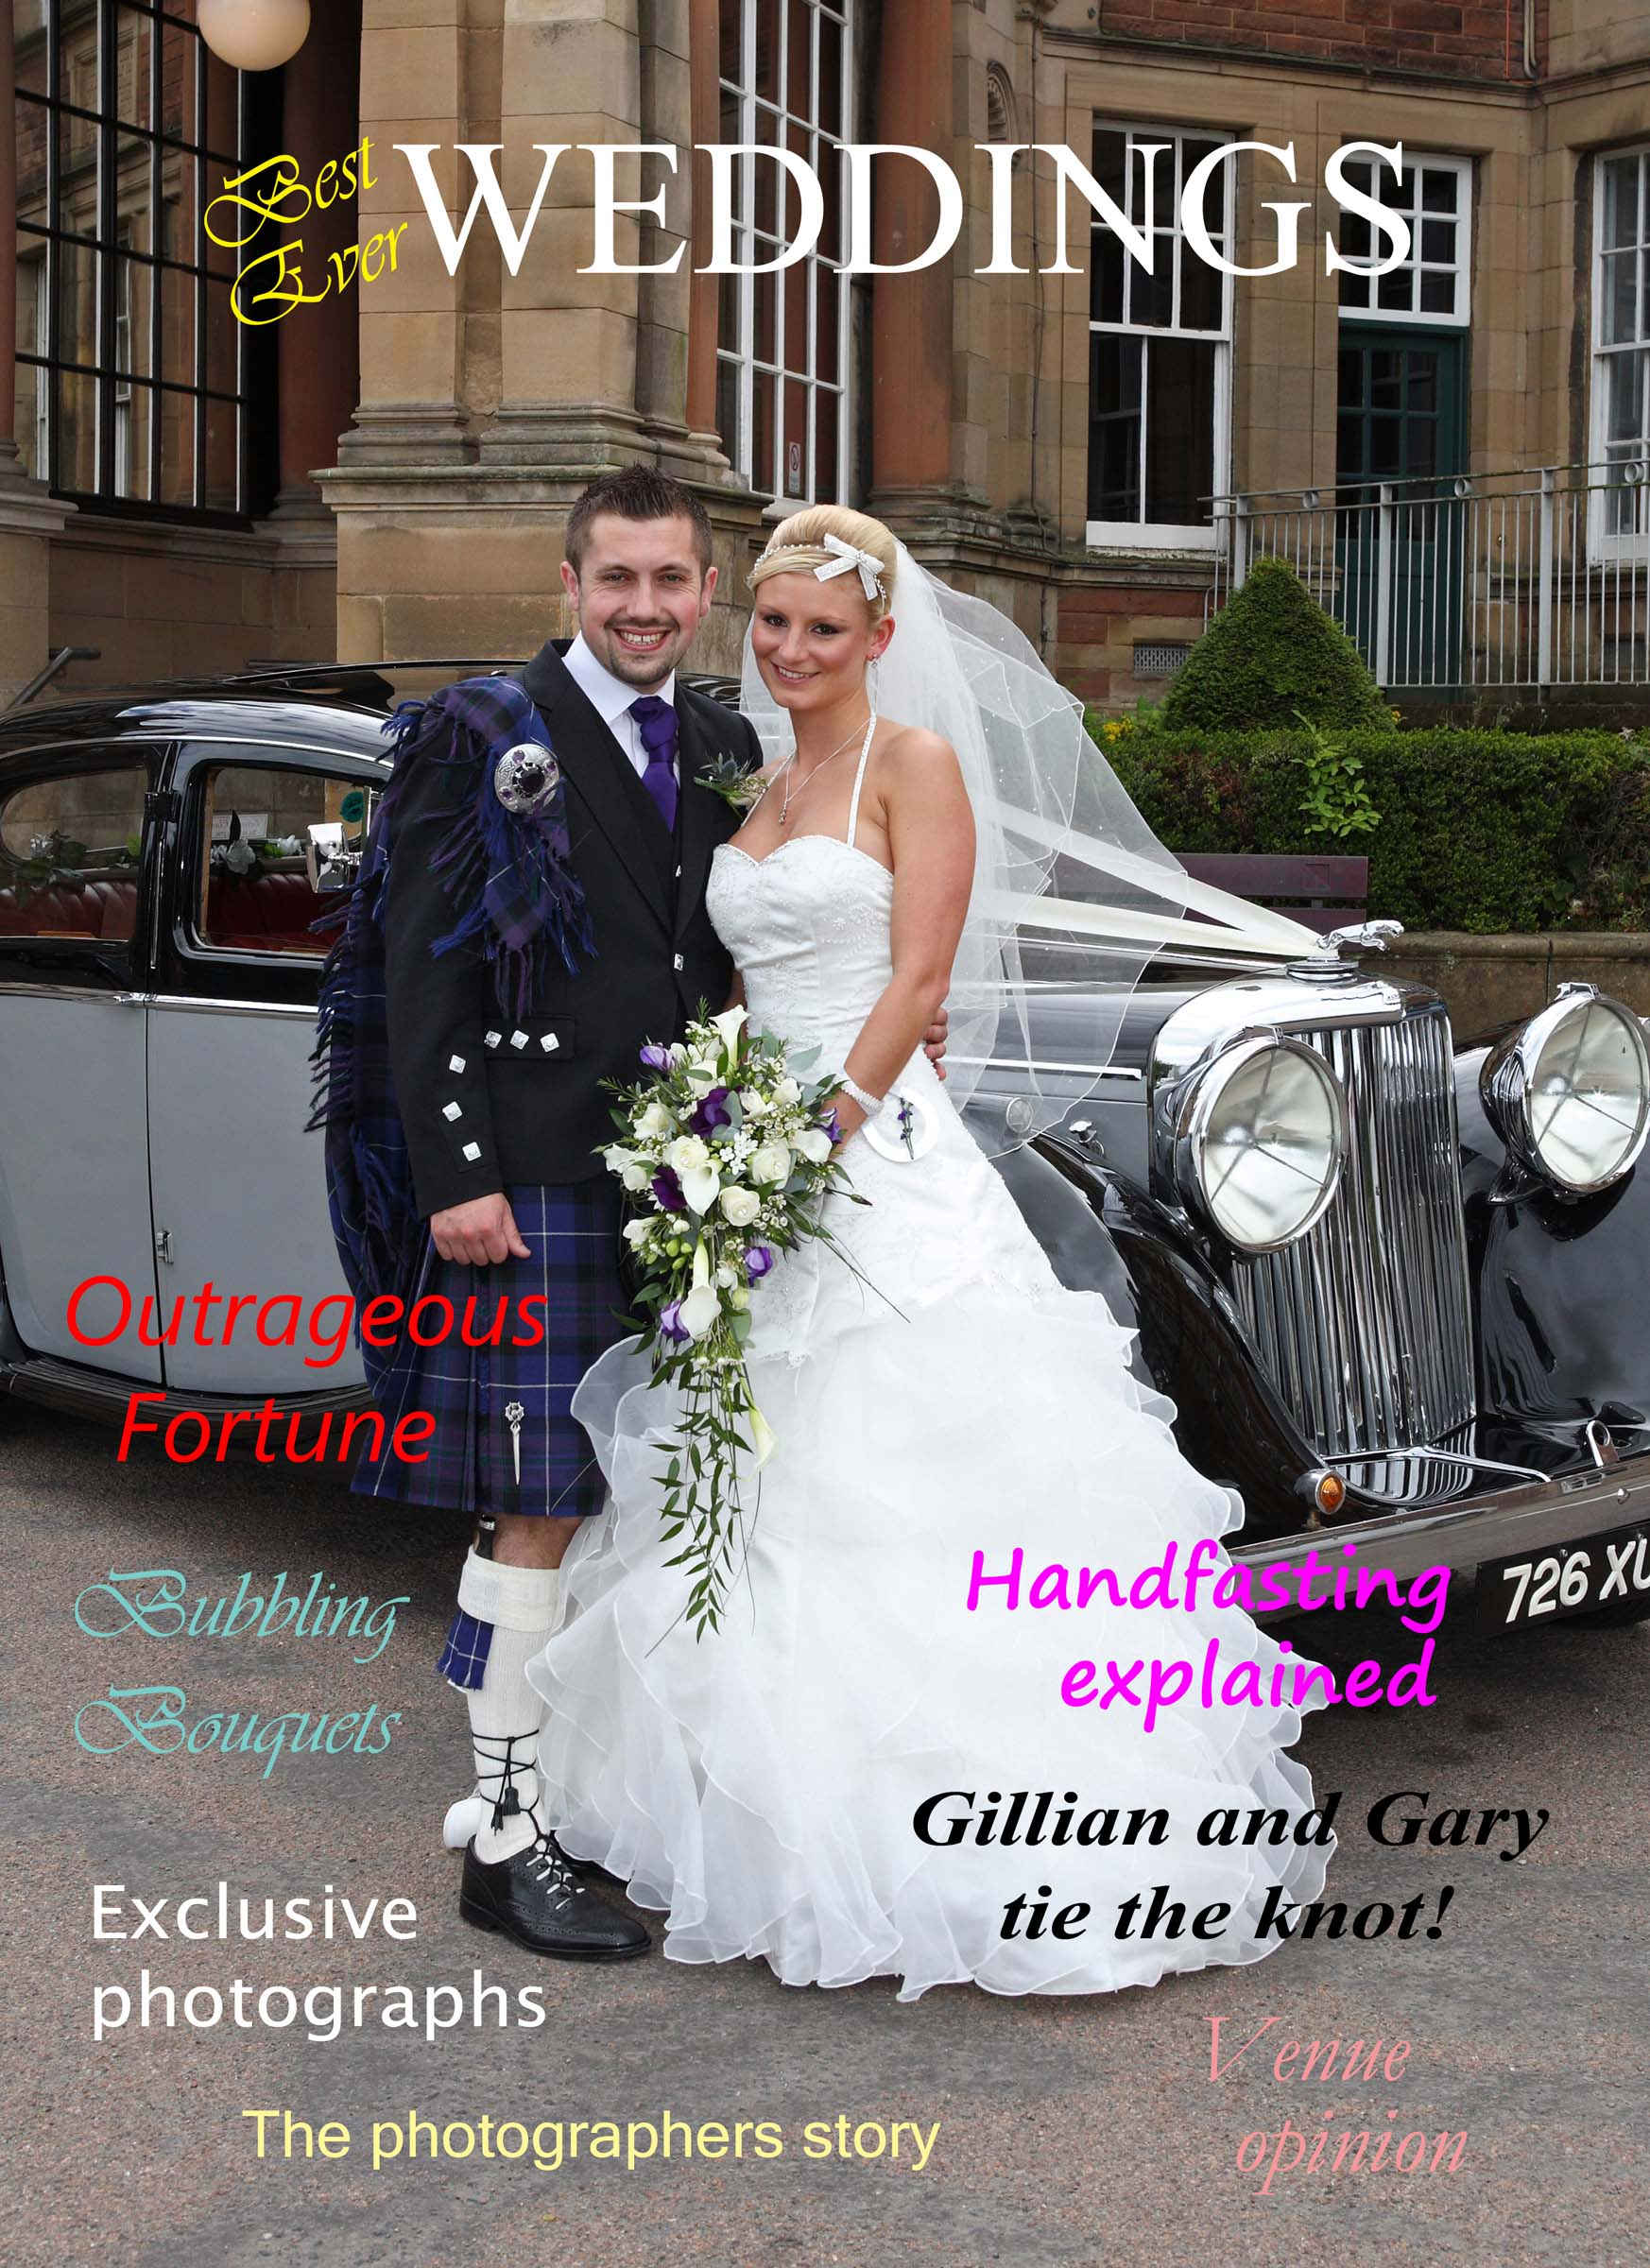 Wedding_Mag_Cover2.jpg